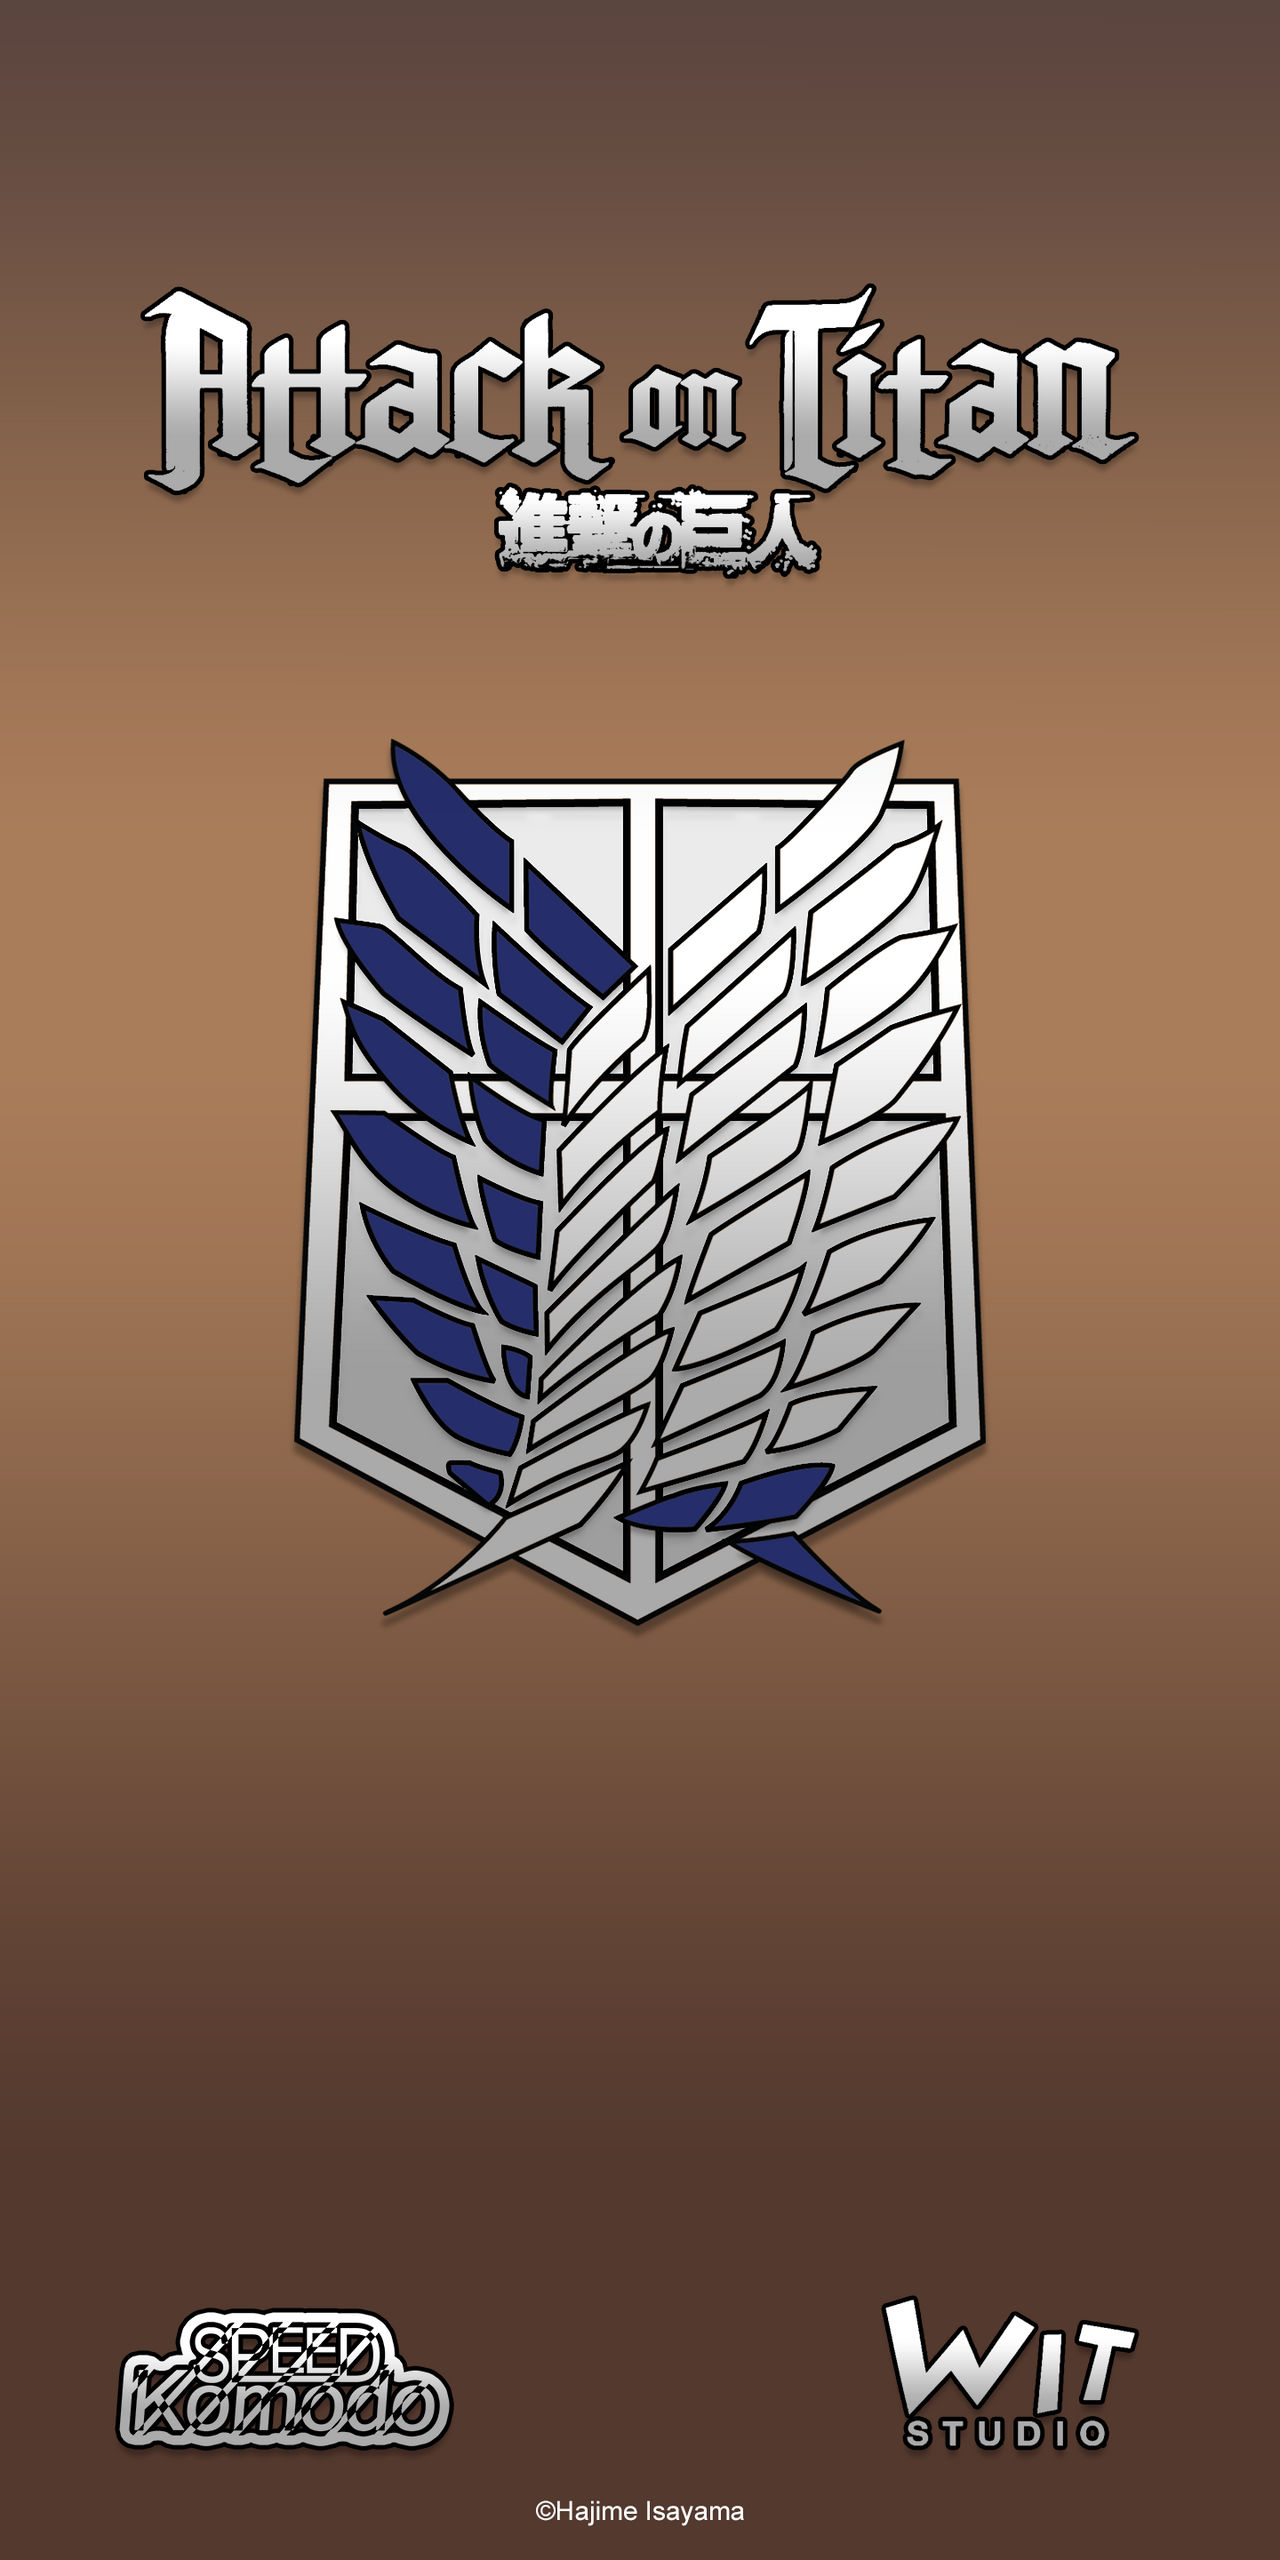 Attack On Titan Scouting Legion Wallpaper By Speedkomodo On Deviantart